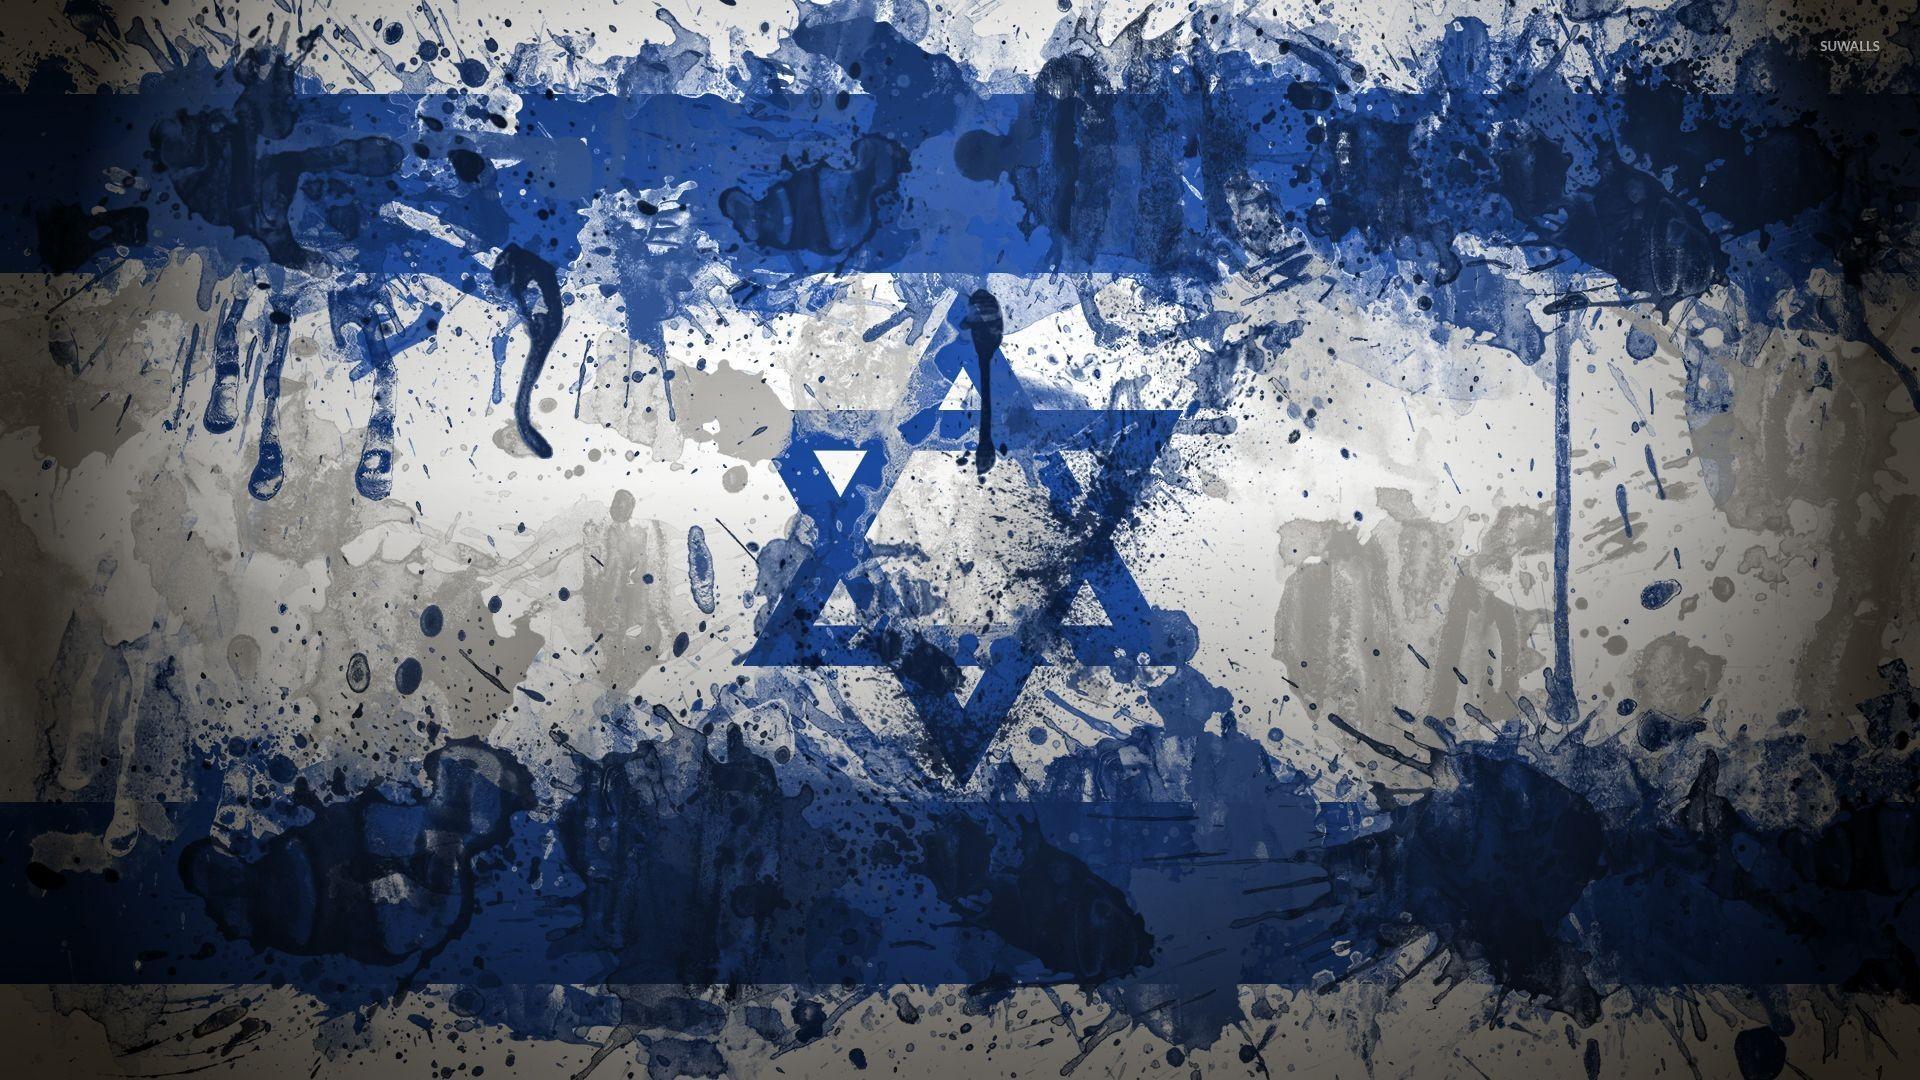 is(that)raeli flag